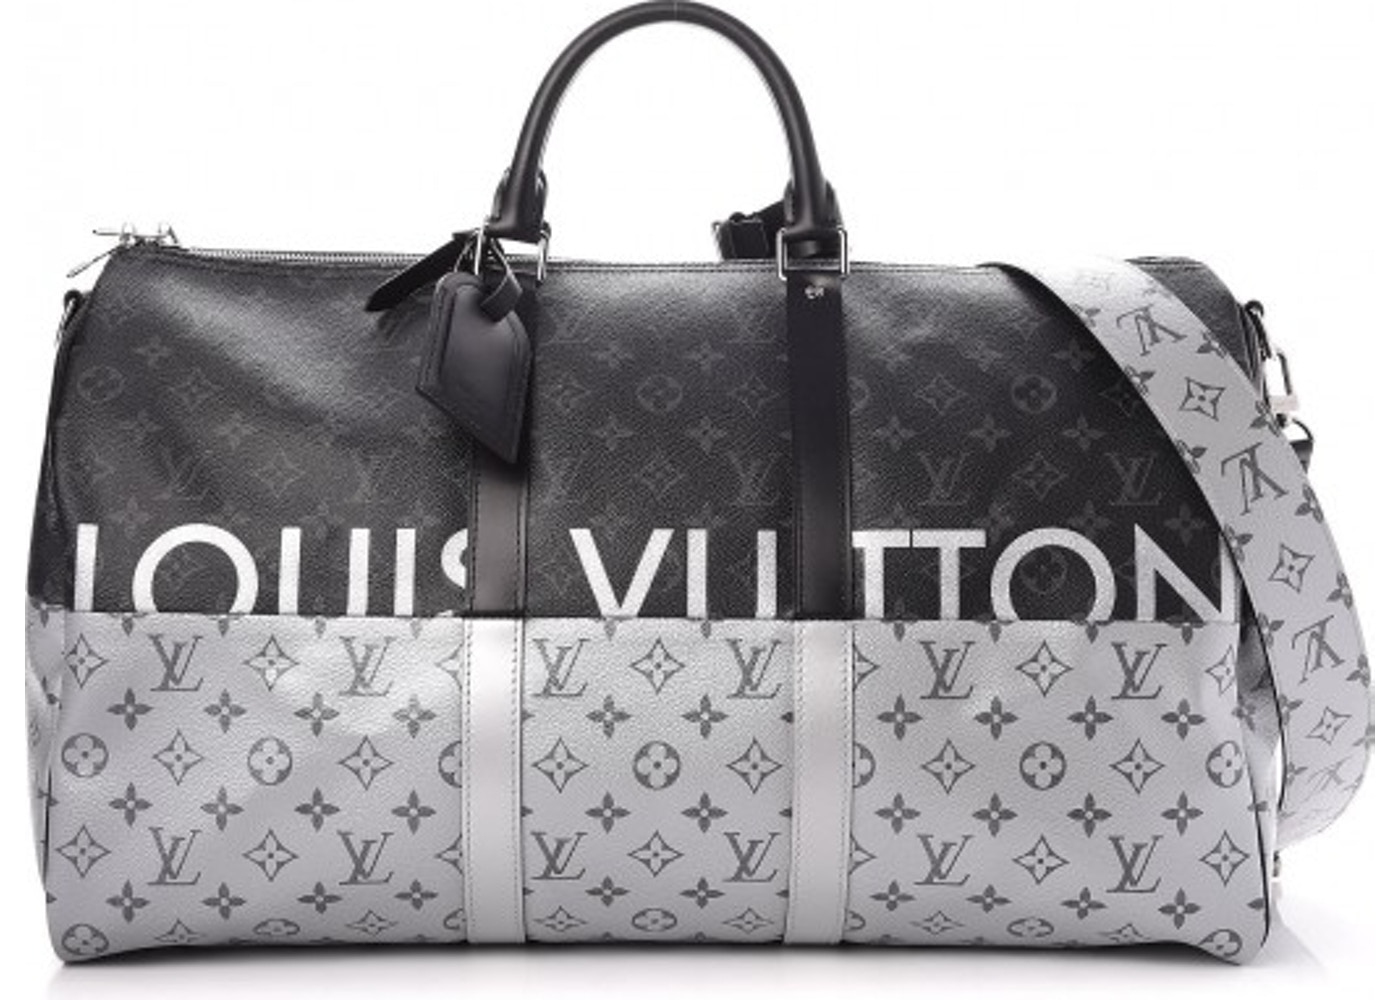 896b88d876e Louis Vuitton Keepall Bandouliere Monogram Eclipse Split With Accessories  50 Black/Silver